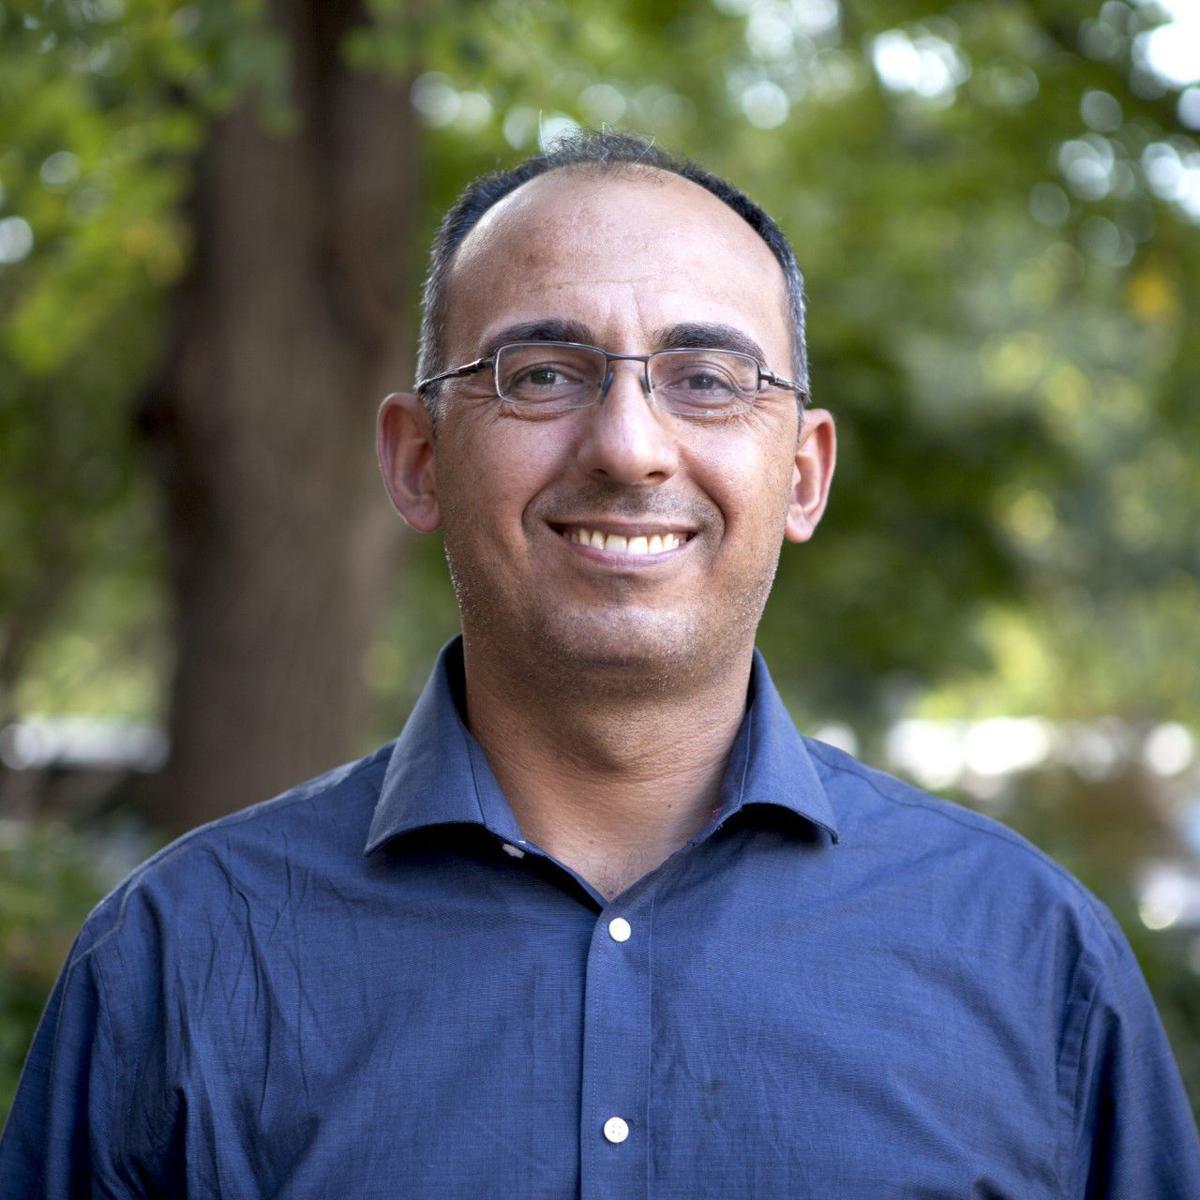 Bassam Mahmood